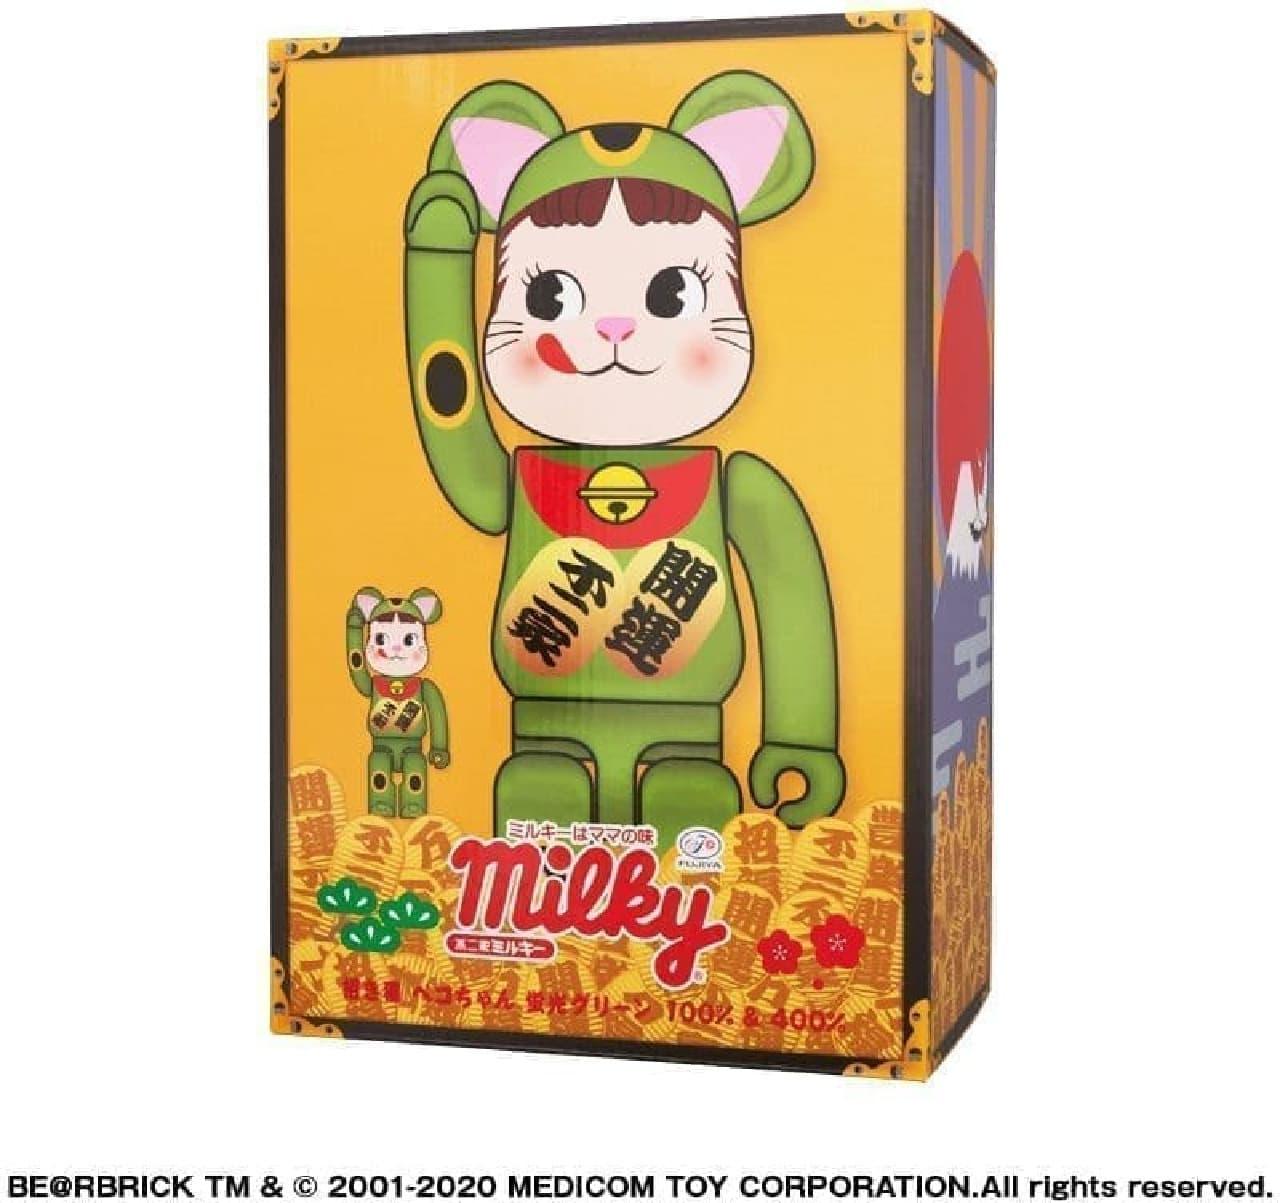 BE@RBRICK 招き猫 ペコちゃん 蛍光グリーン 100% & 400%